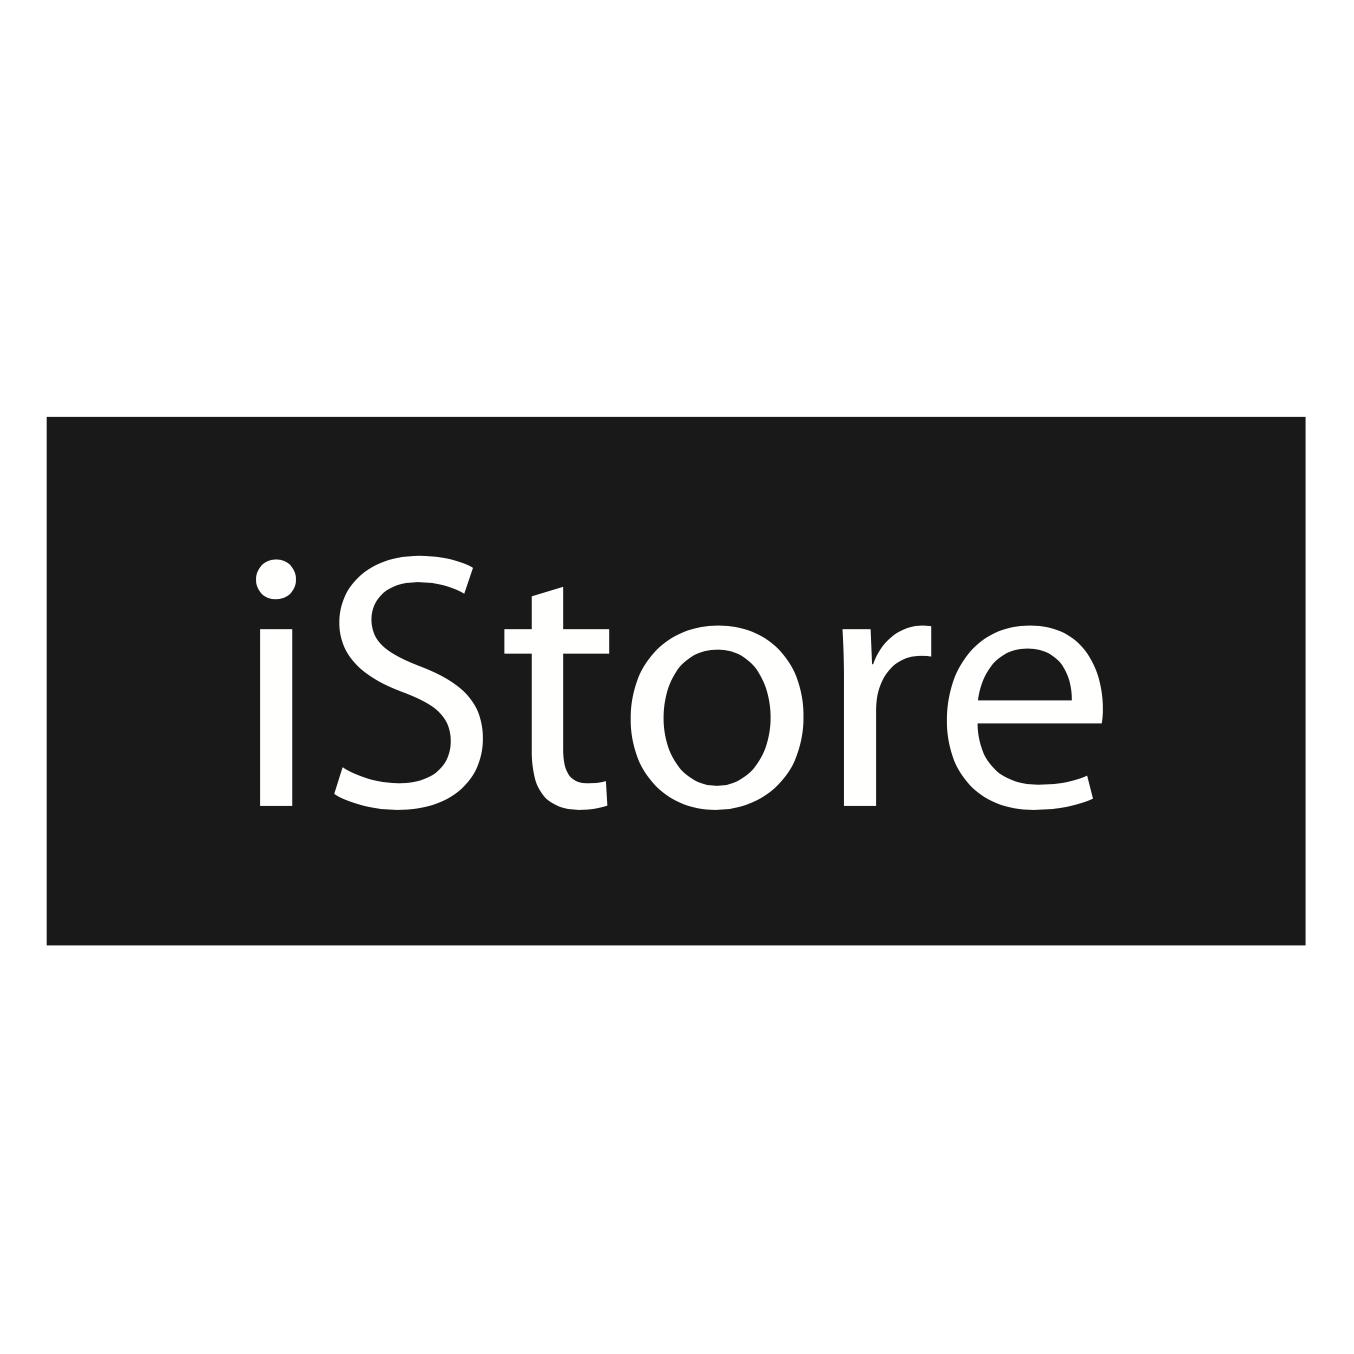 MacBook 12-inch Neoprene Classic Sleeve - Grey